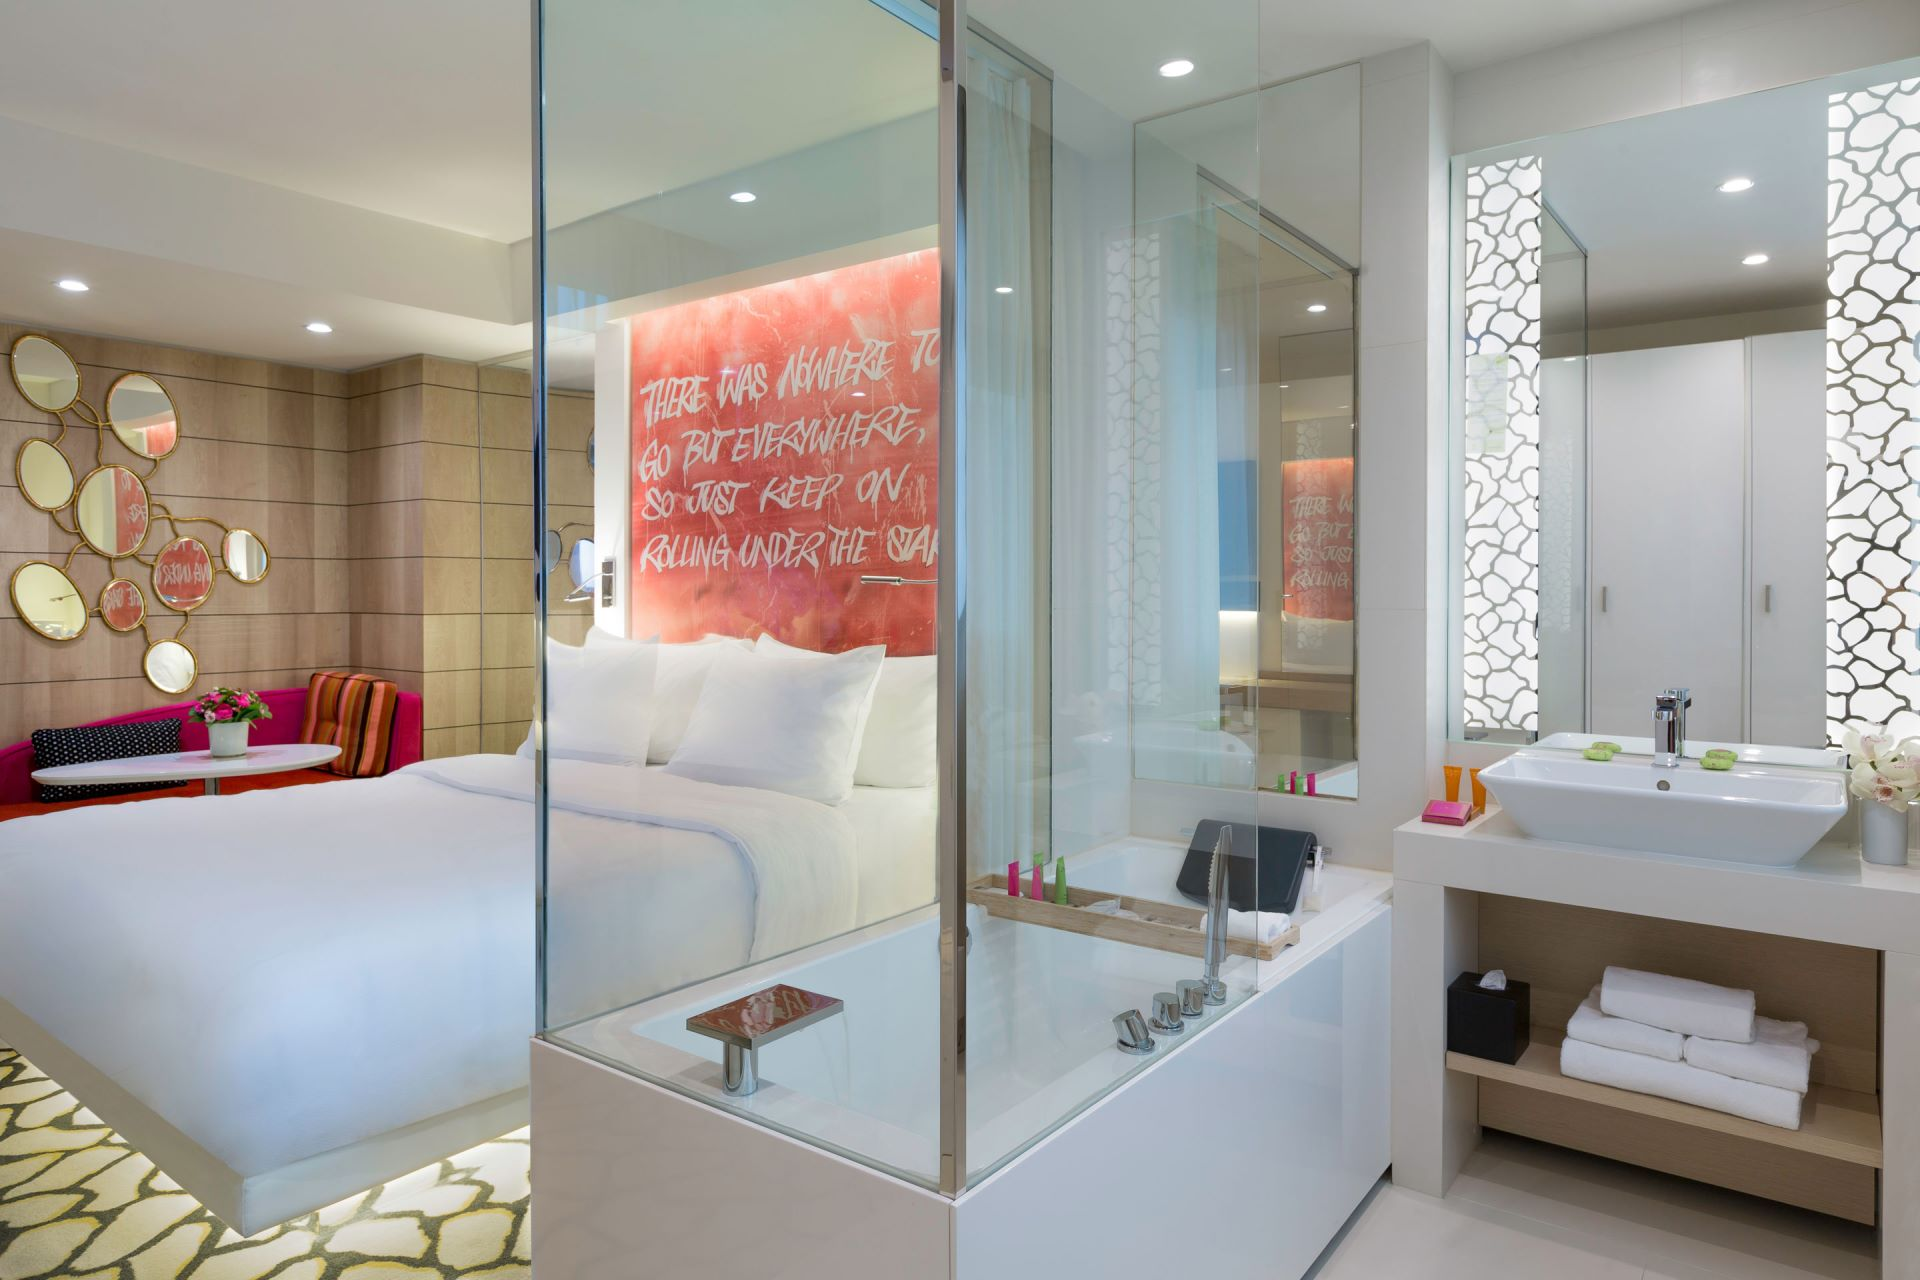 Manotel-Hotel-NvY-Geneve-Chambre-Executive-03